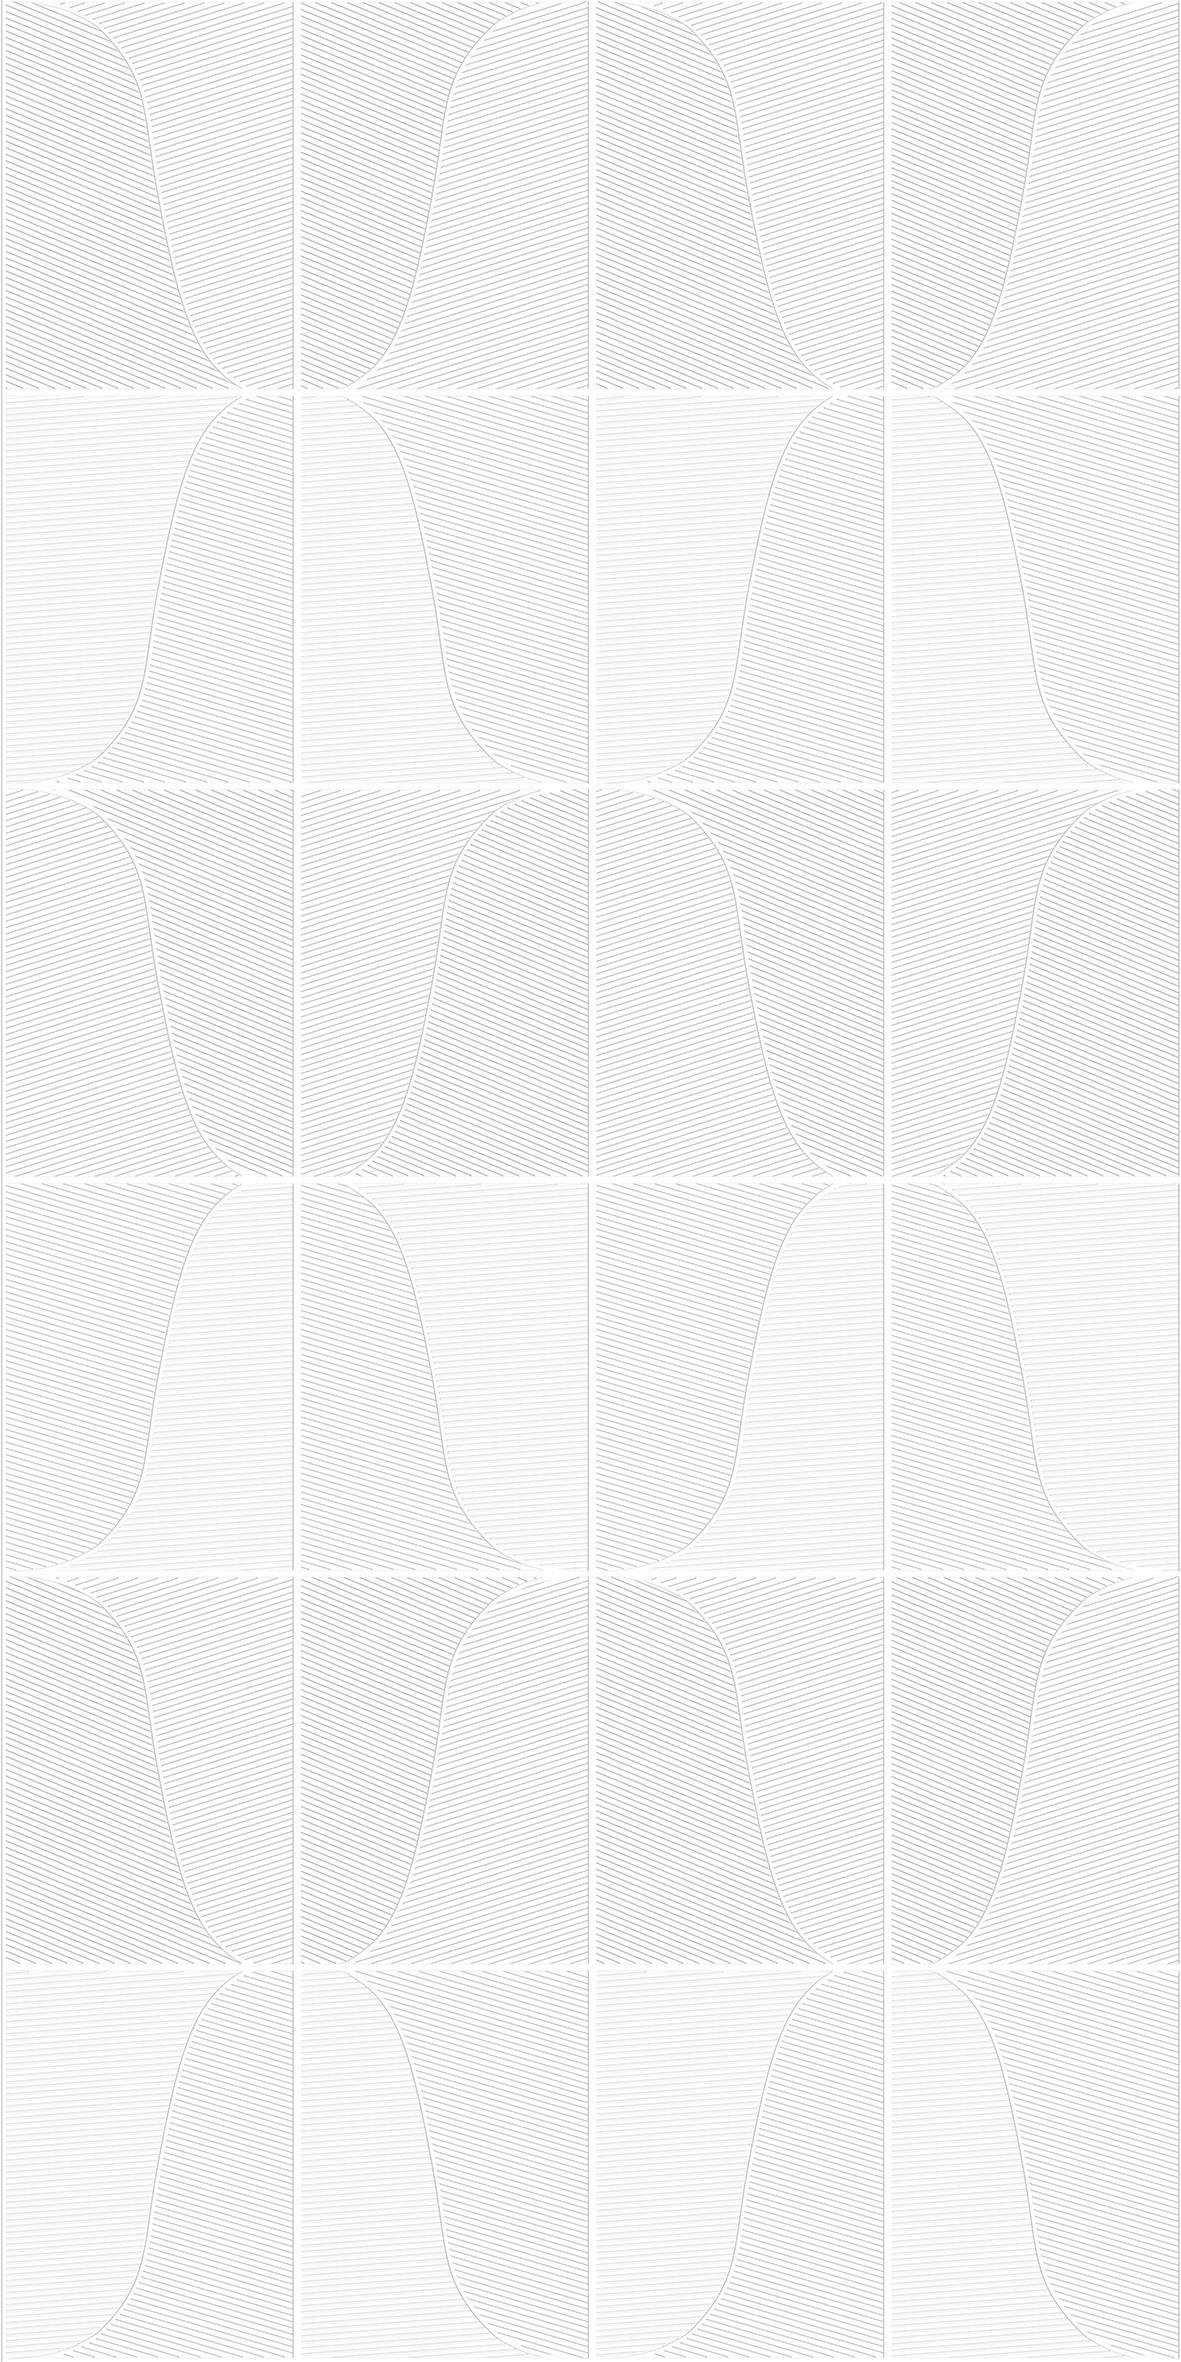 VP-3D60999  300x600;VP-3D60999-J1  300x600